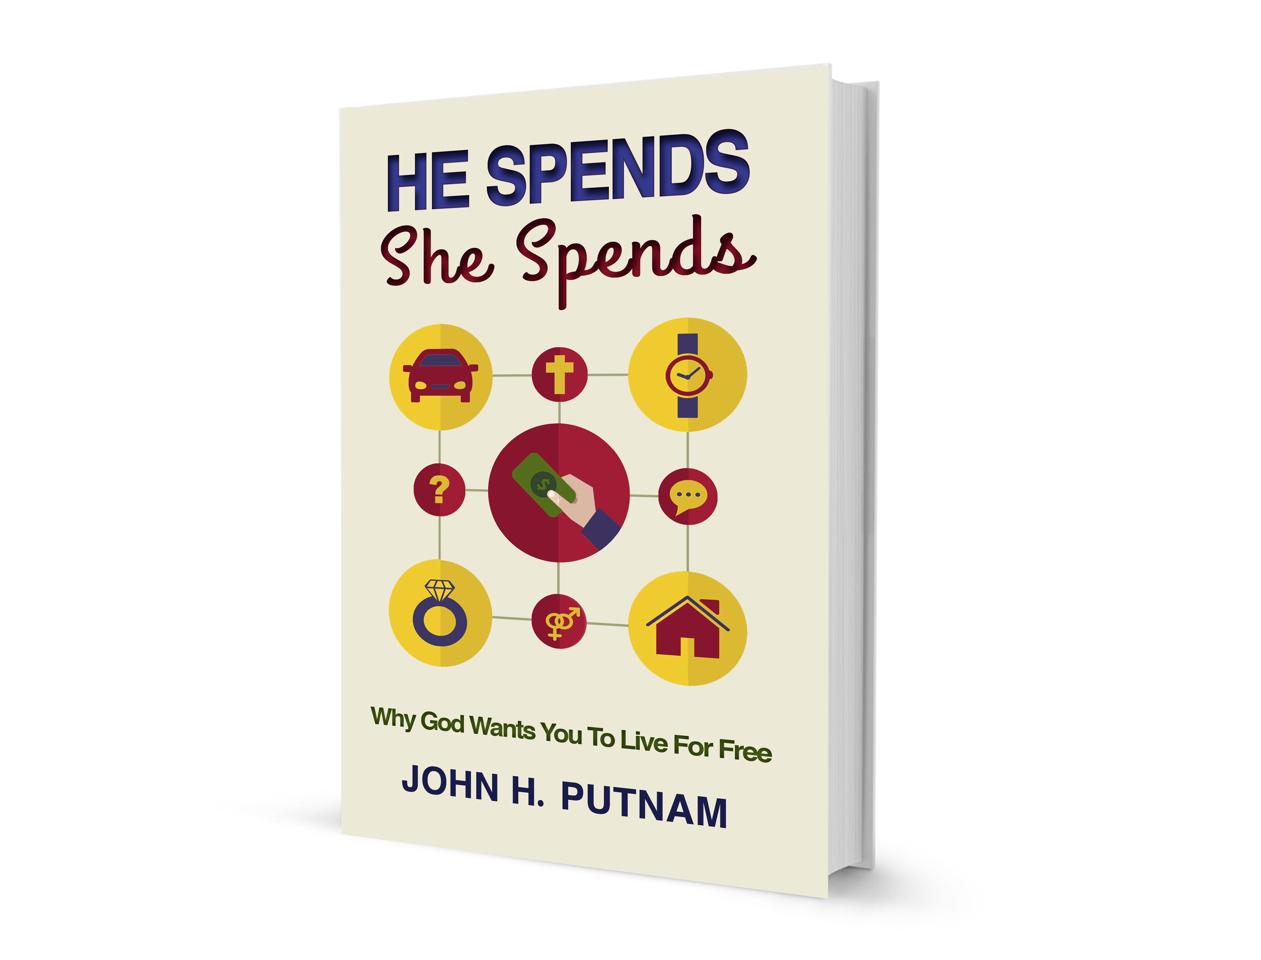 He Spends She Spends Trade Book  3D.jpg